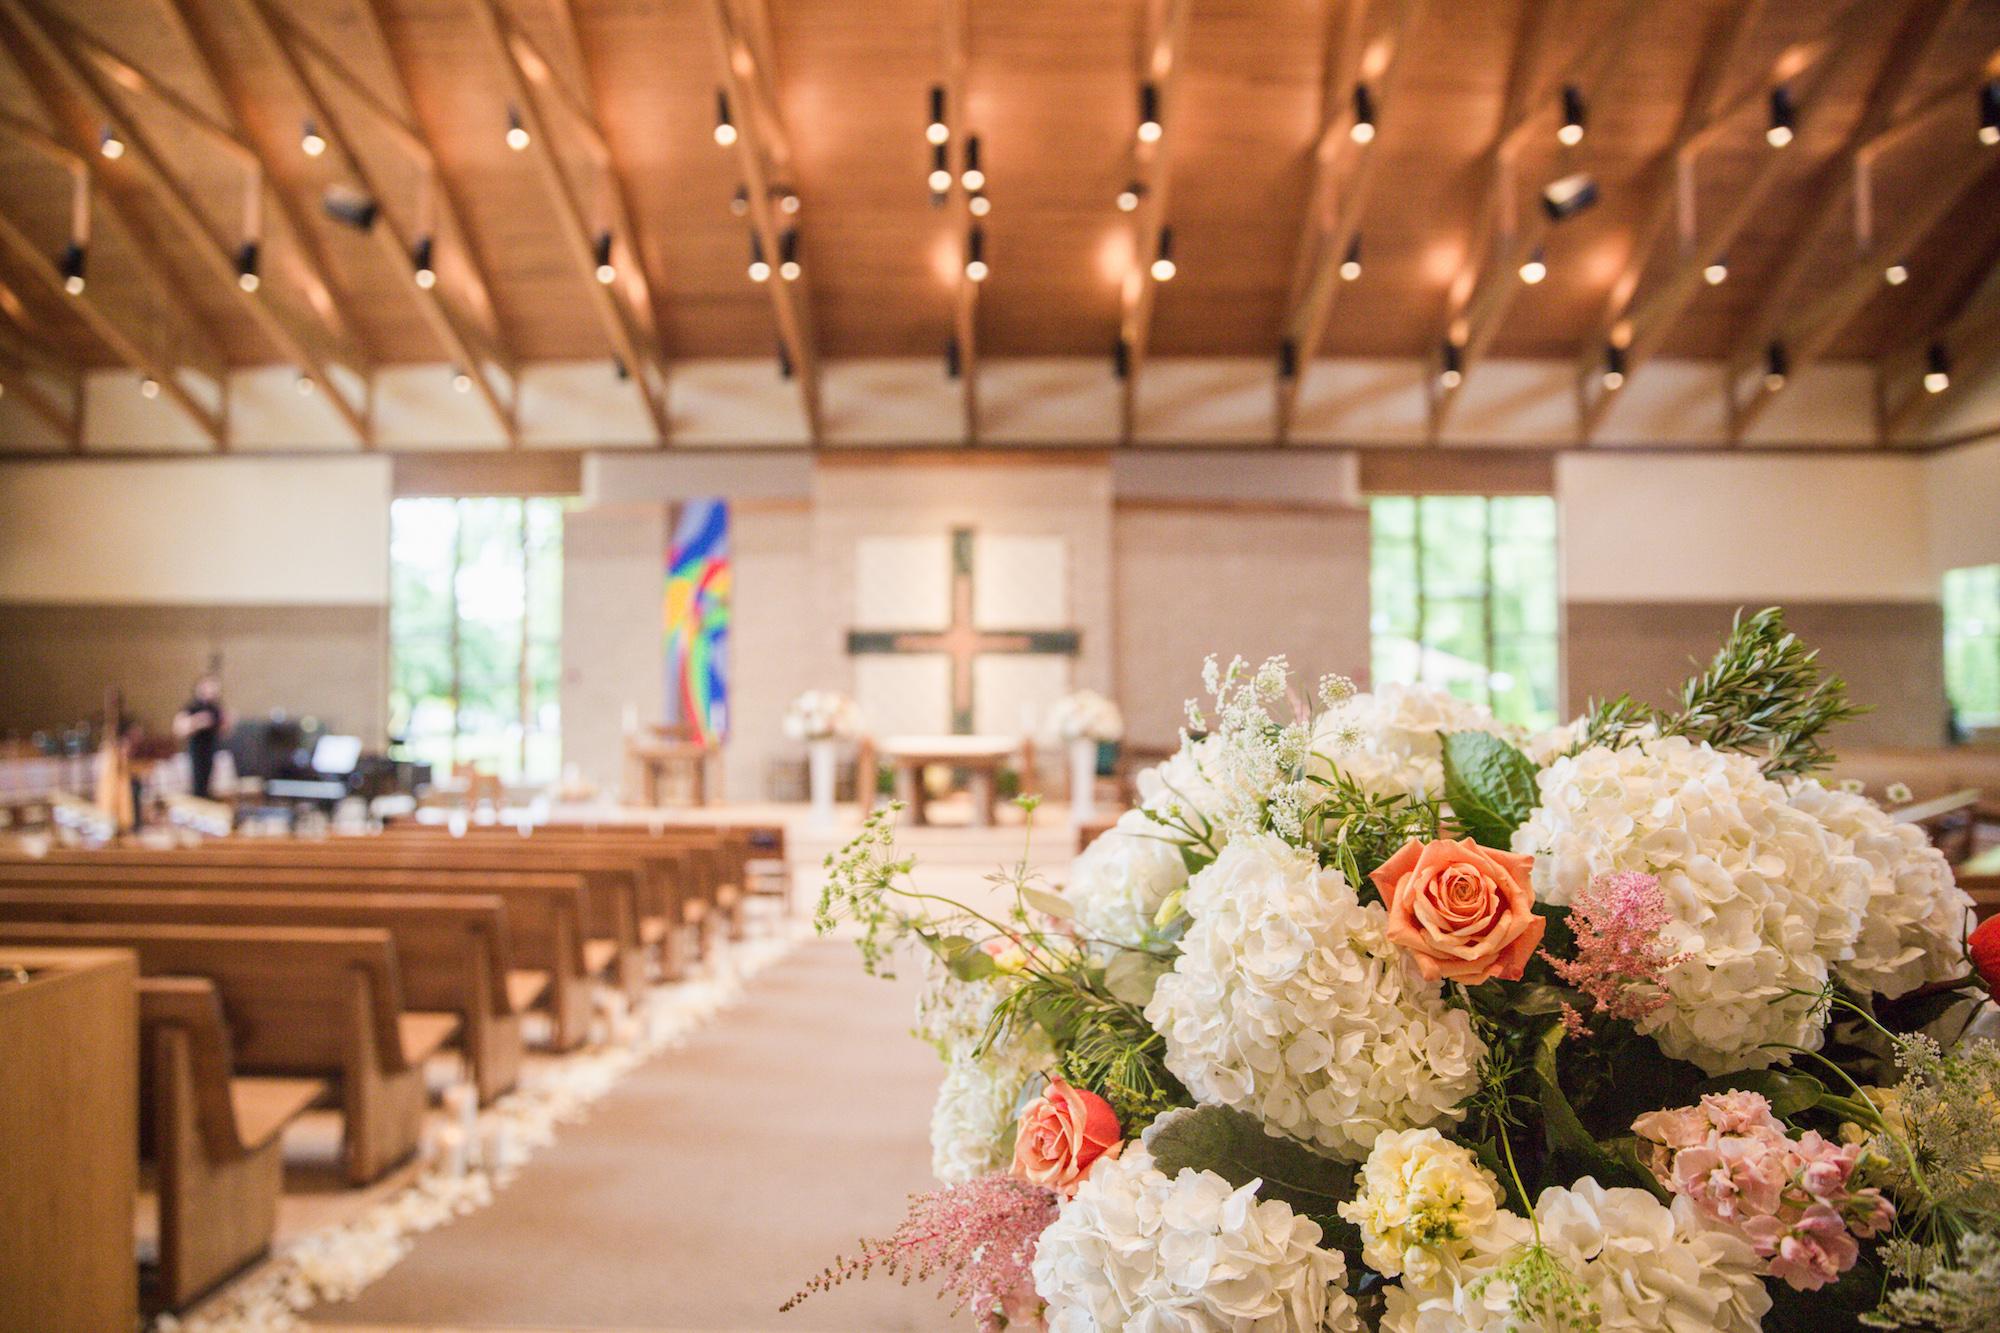 acowsay-cinema-minneapolis-wedding-14.jpg